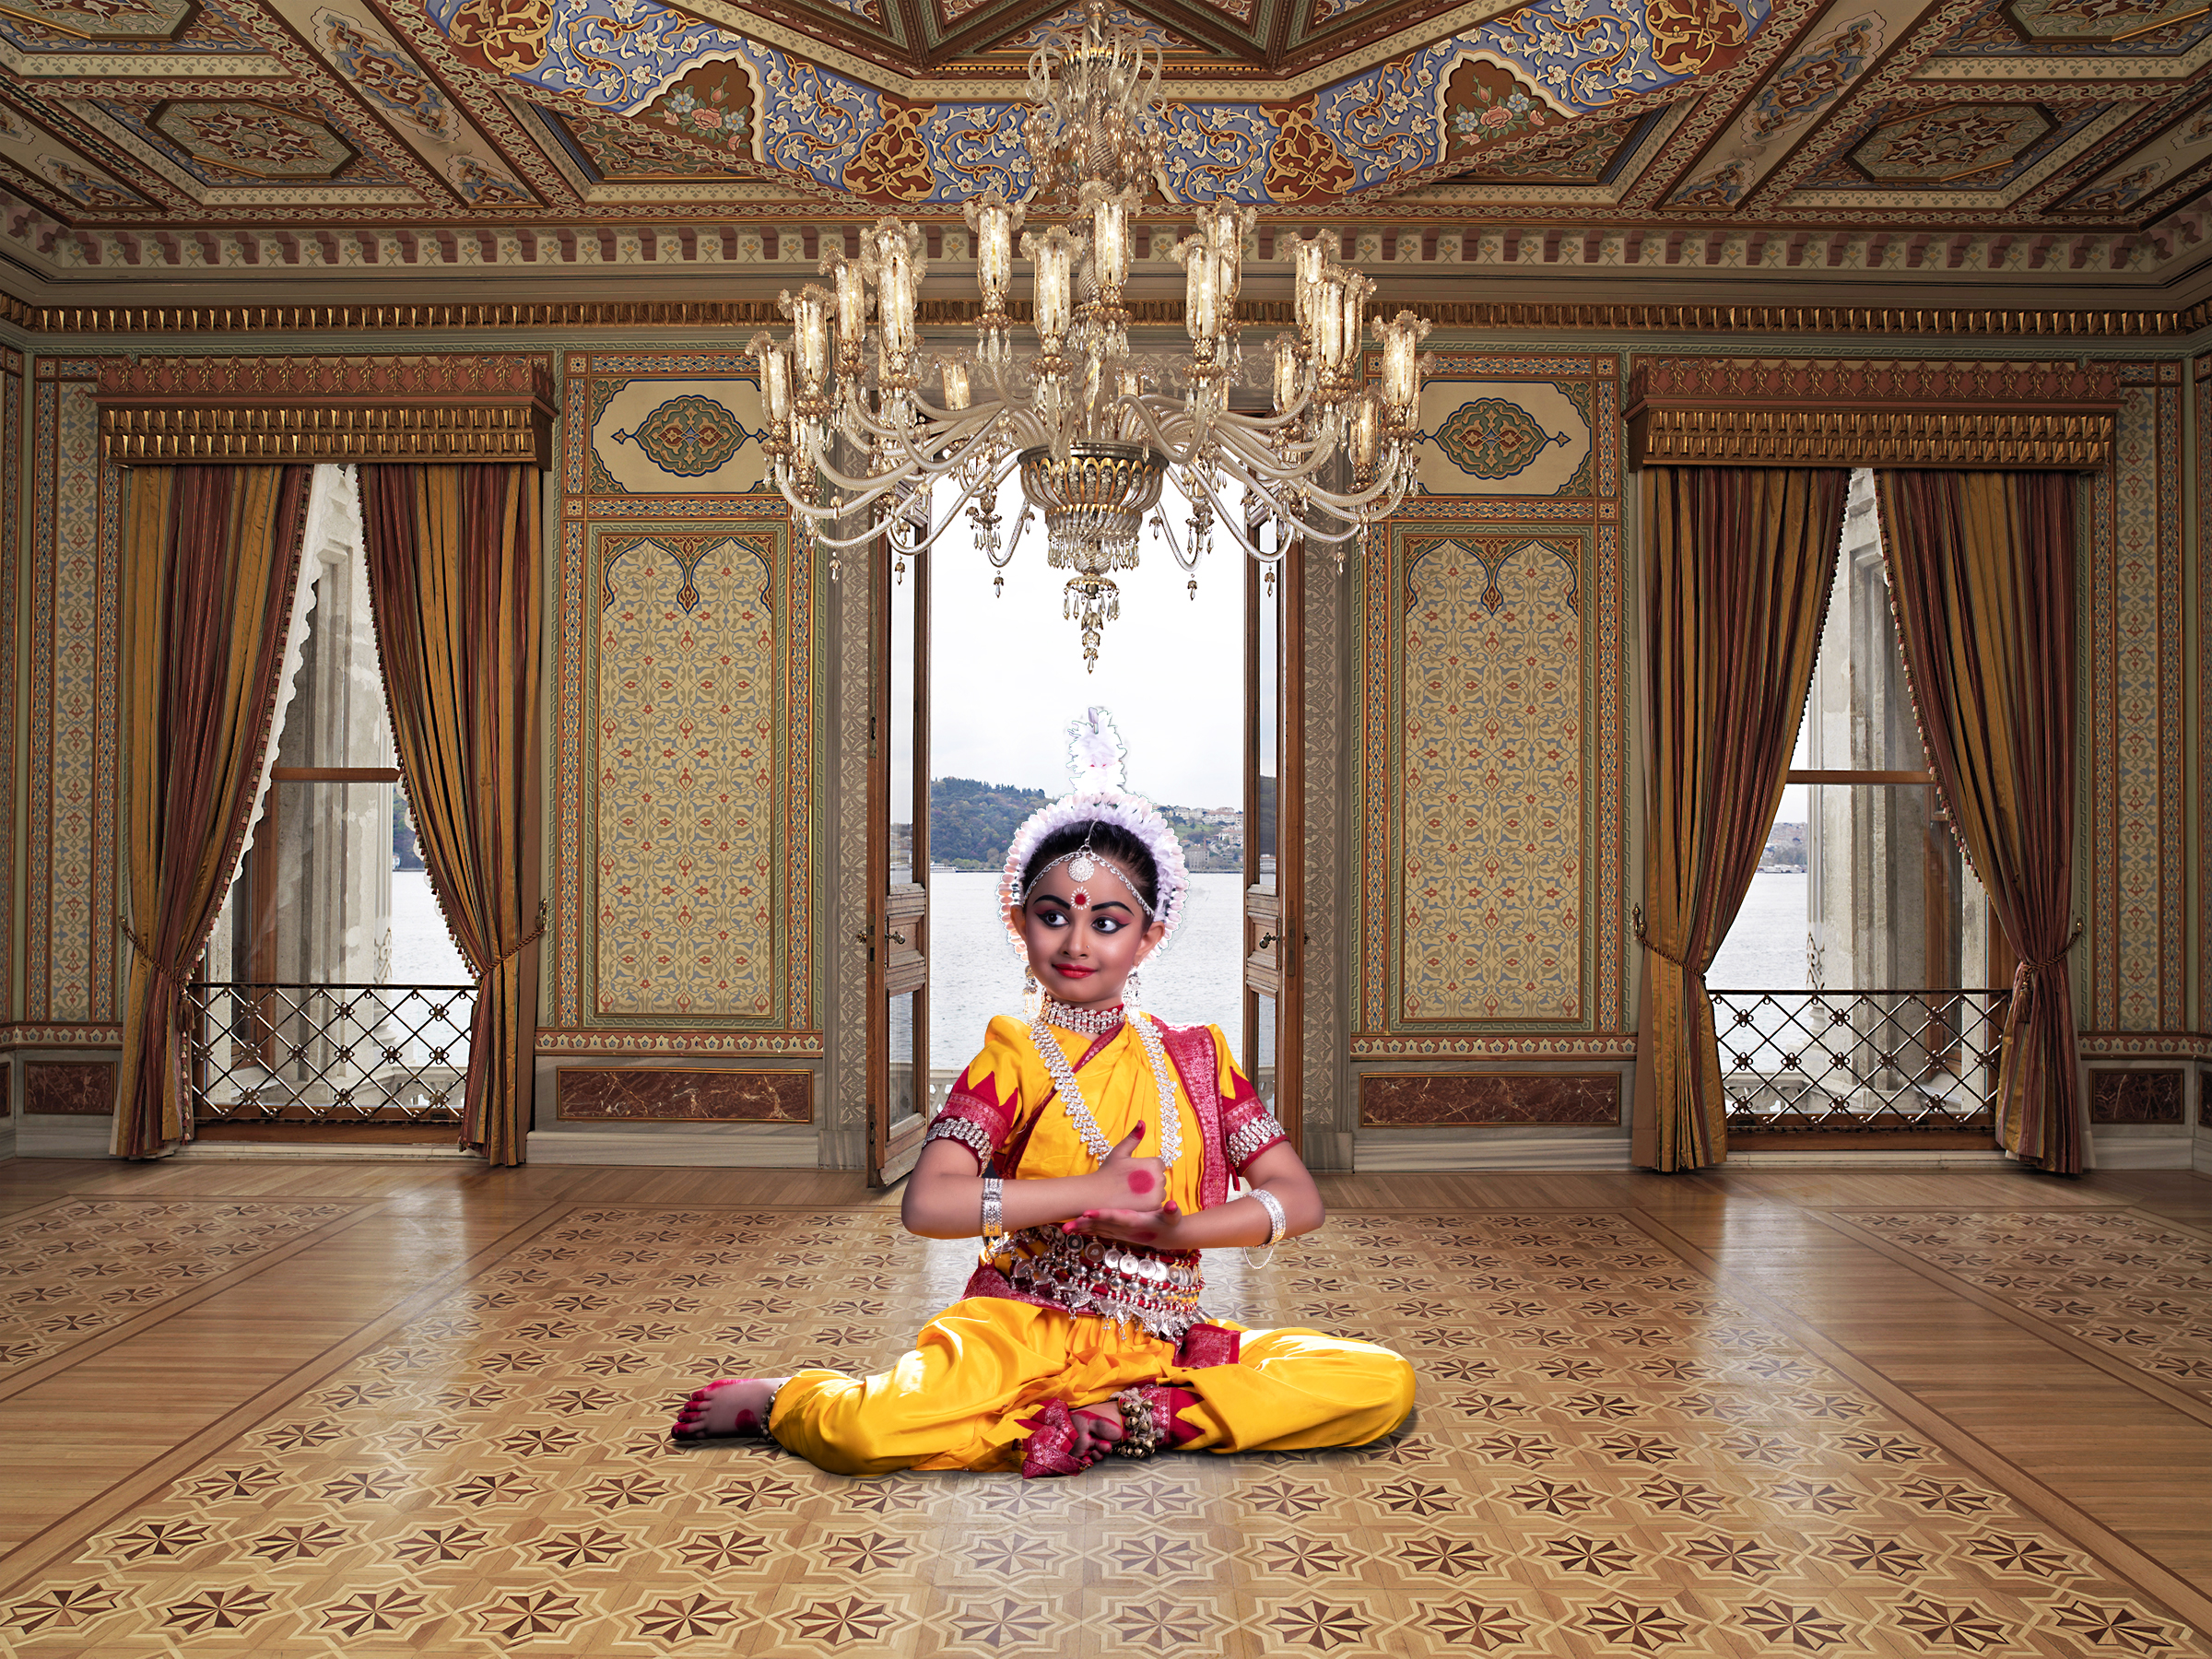 A child classical dancer